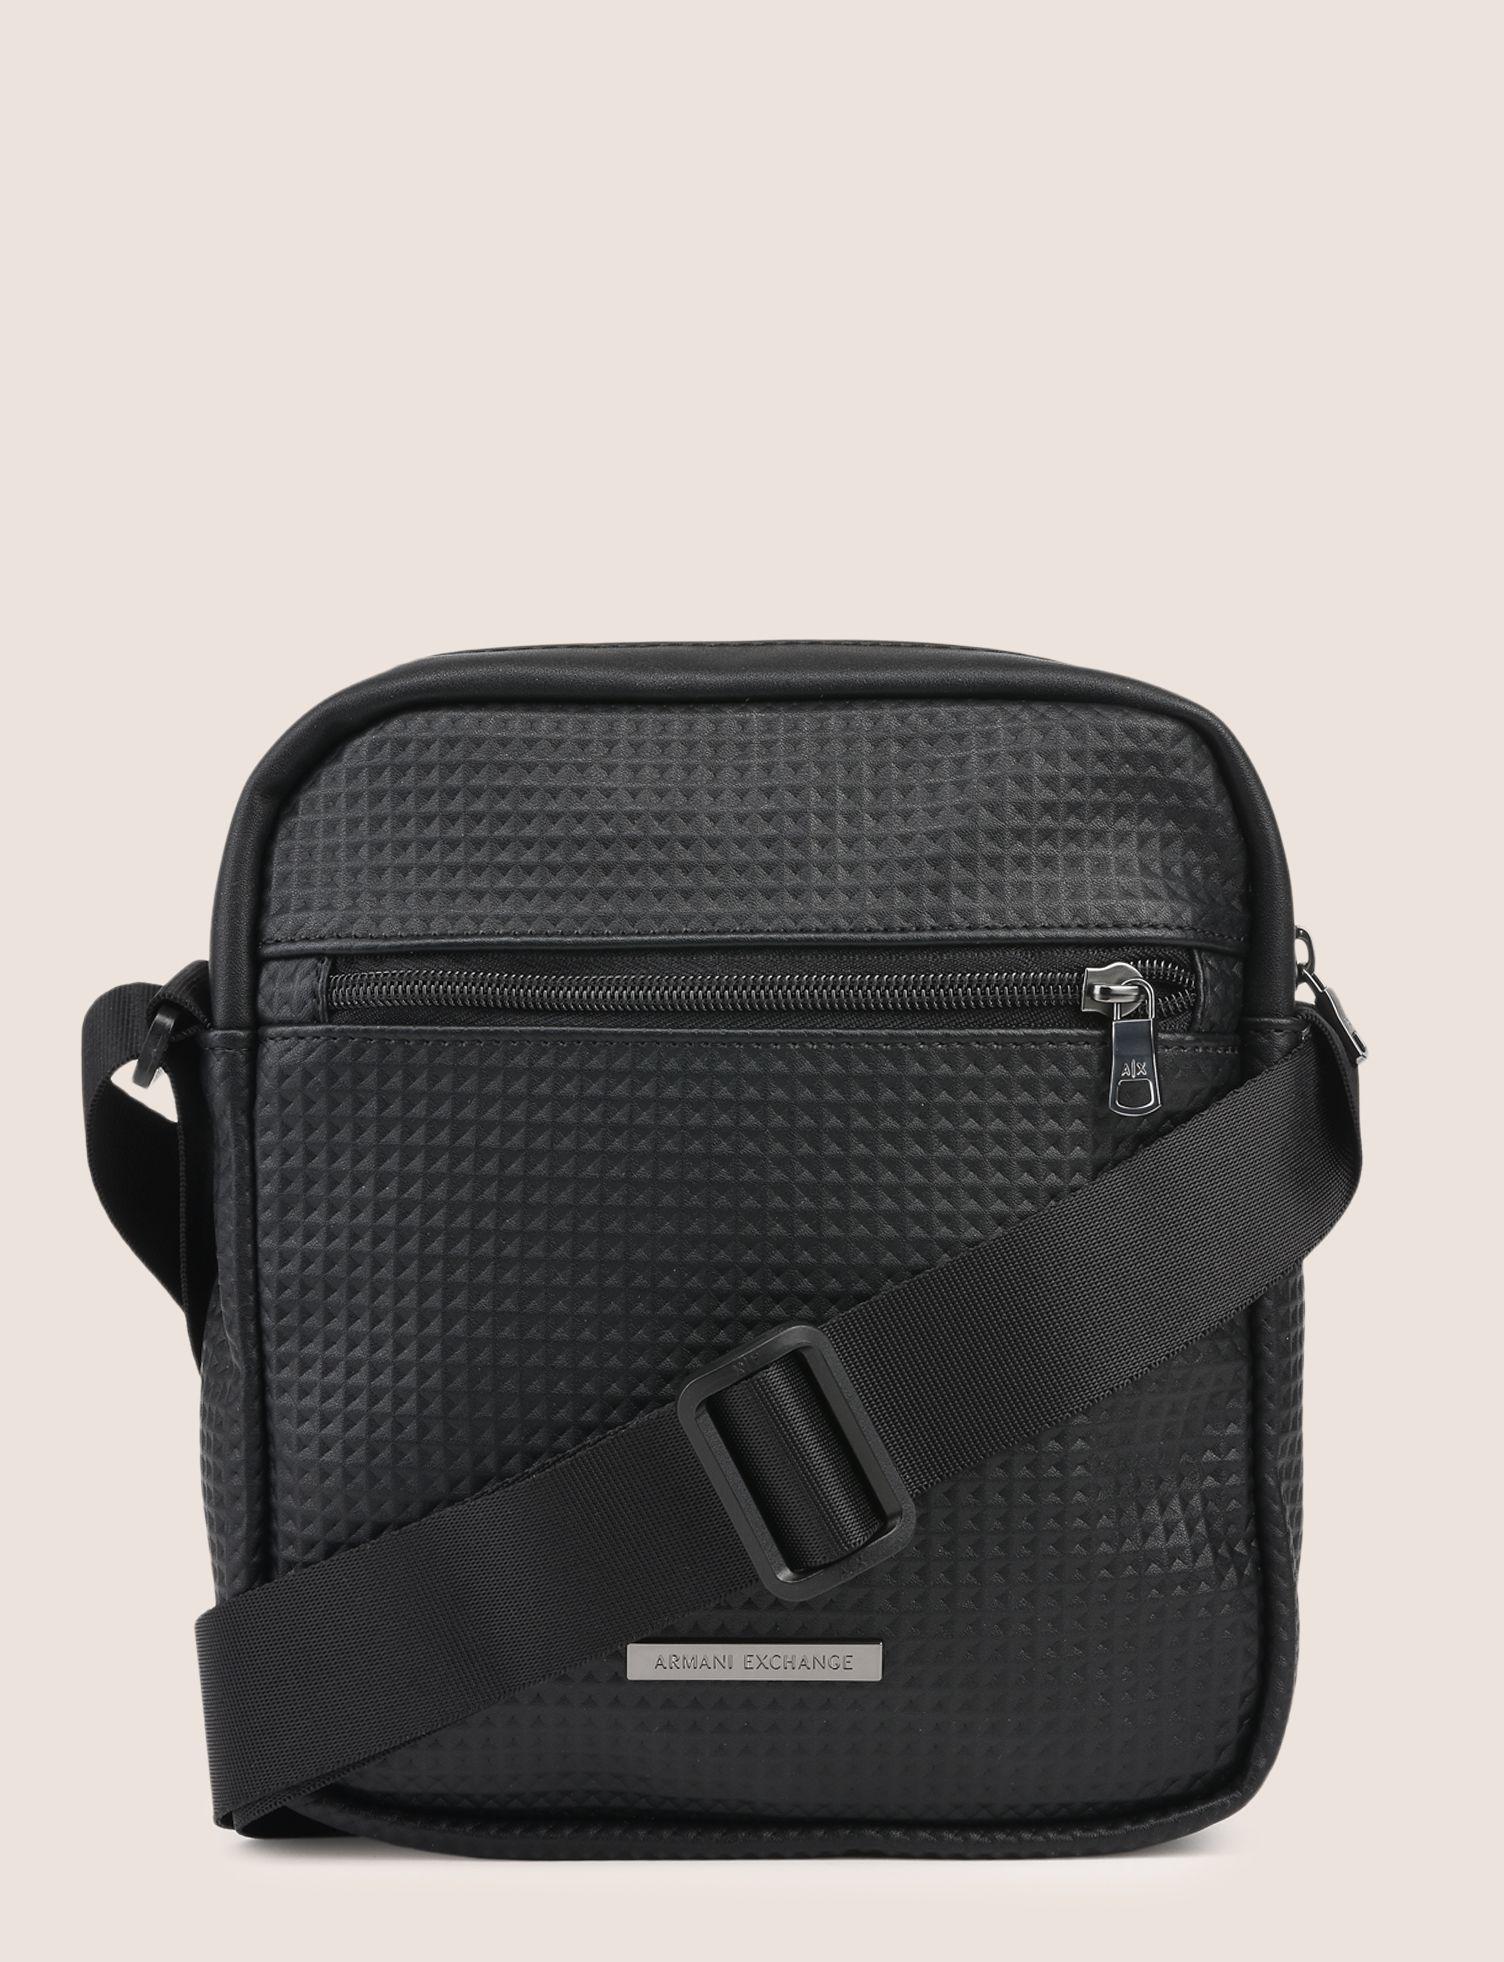 03d998589440 Armani Exchange - Black Embossed Logo Reporter Bag for Men - Lyst. View  fullscreen